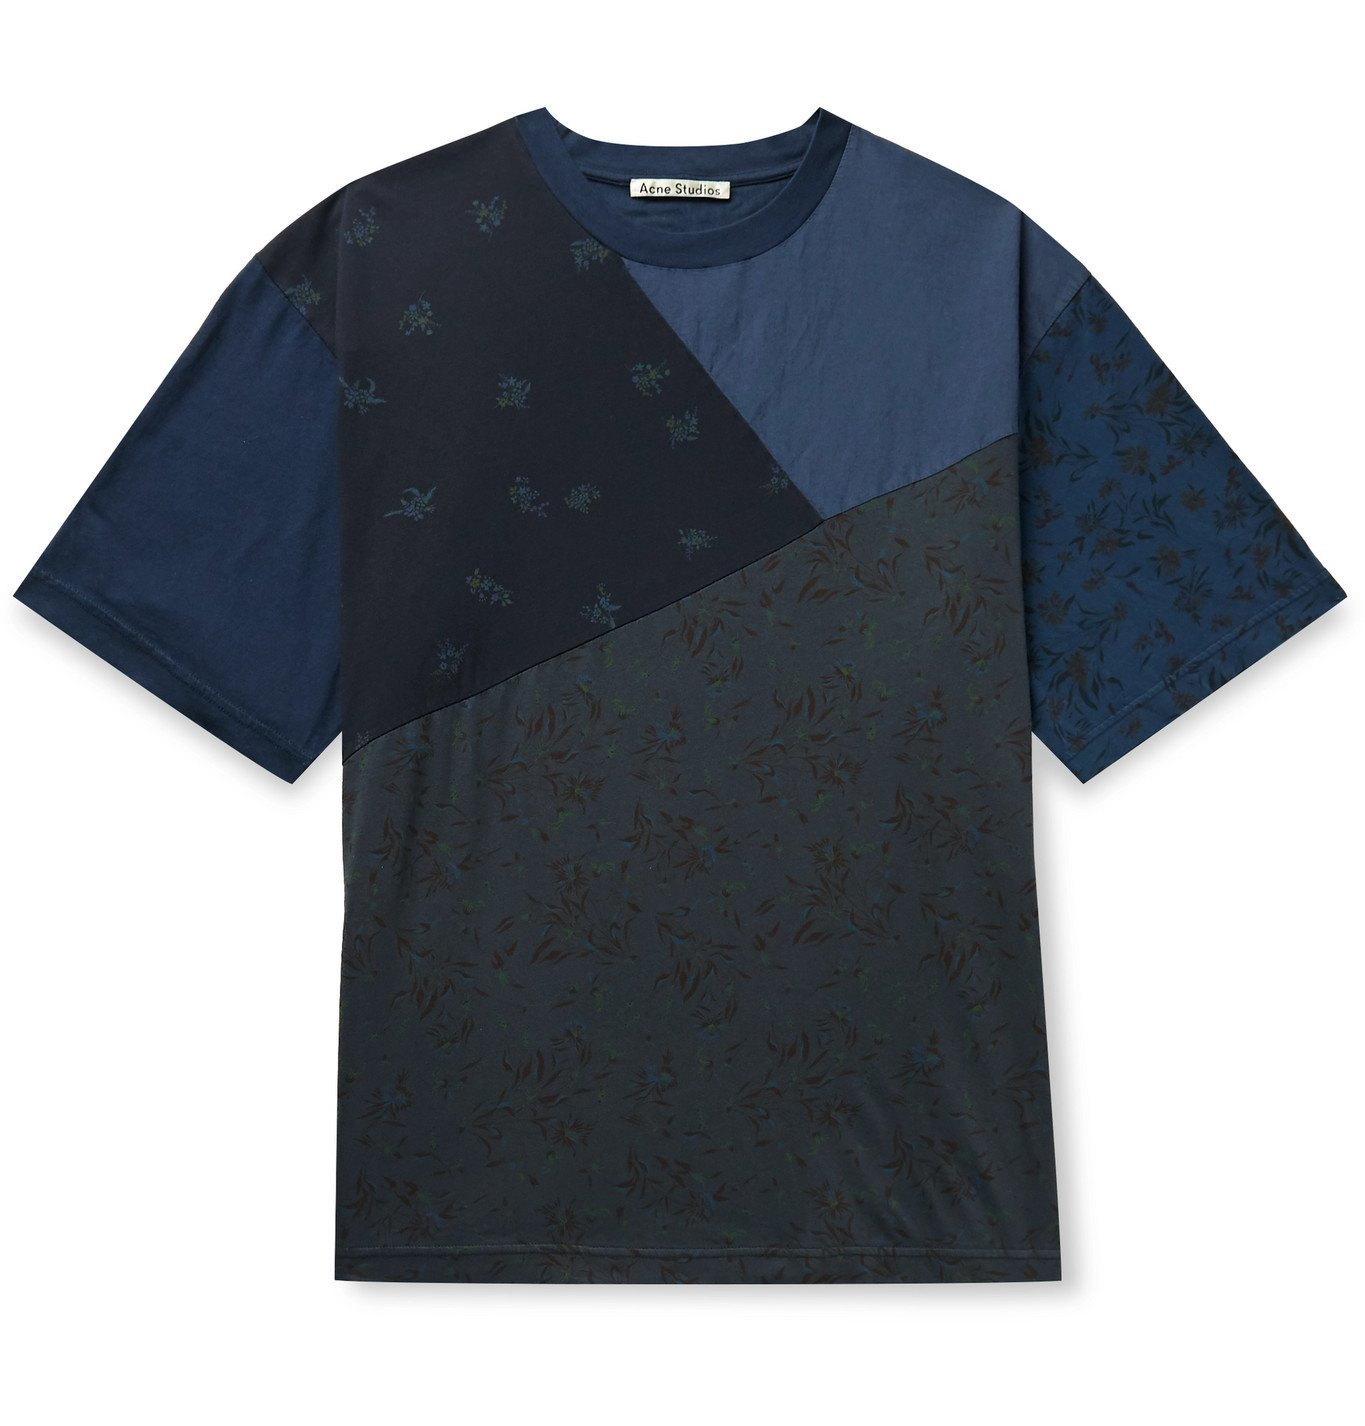 Acne Studios - Patchwork Printed Cotton-Jersey T-Shirt - Blue